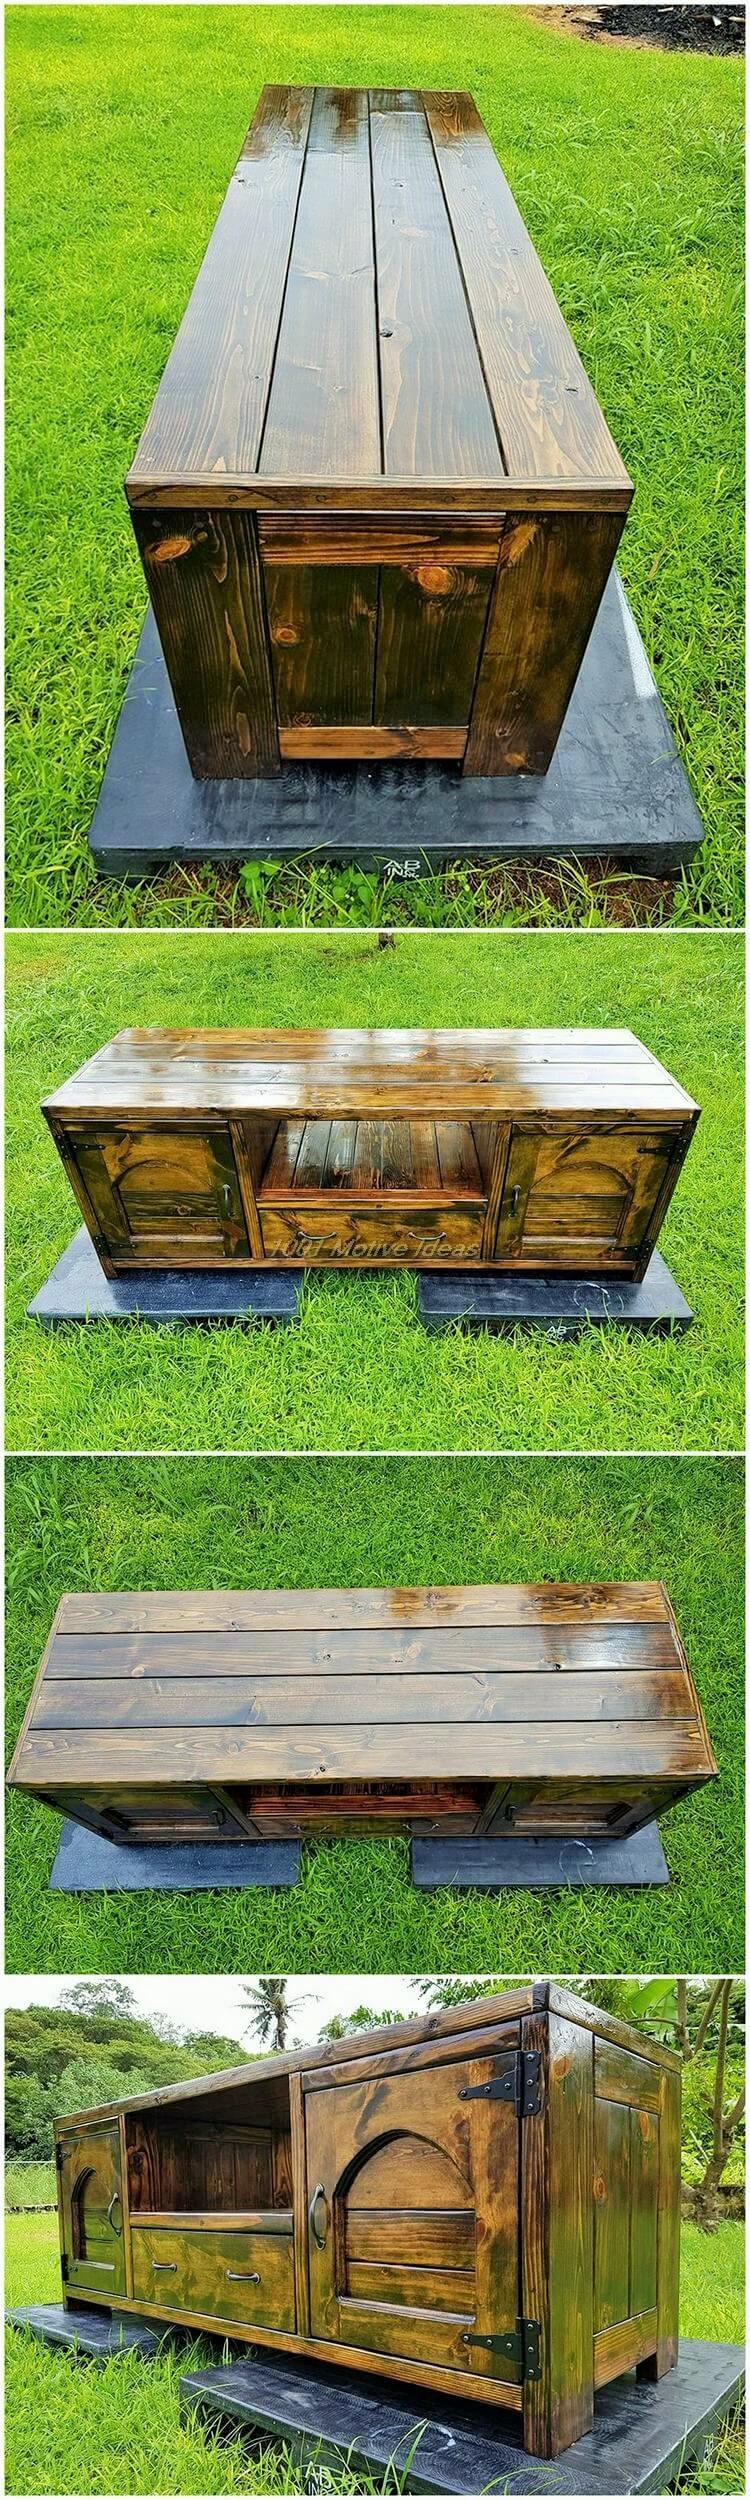 wooden-Pallet-Kitchen-furniture-Project-Ideas-008